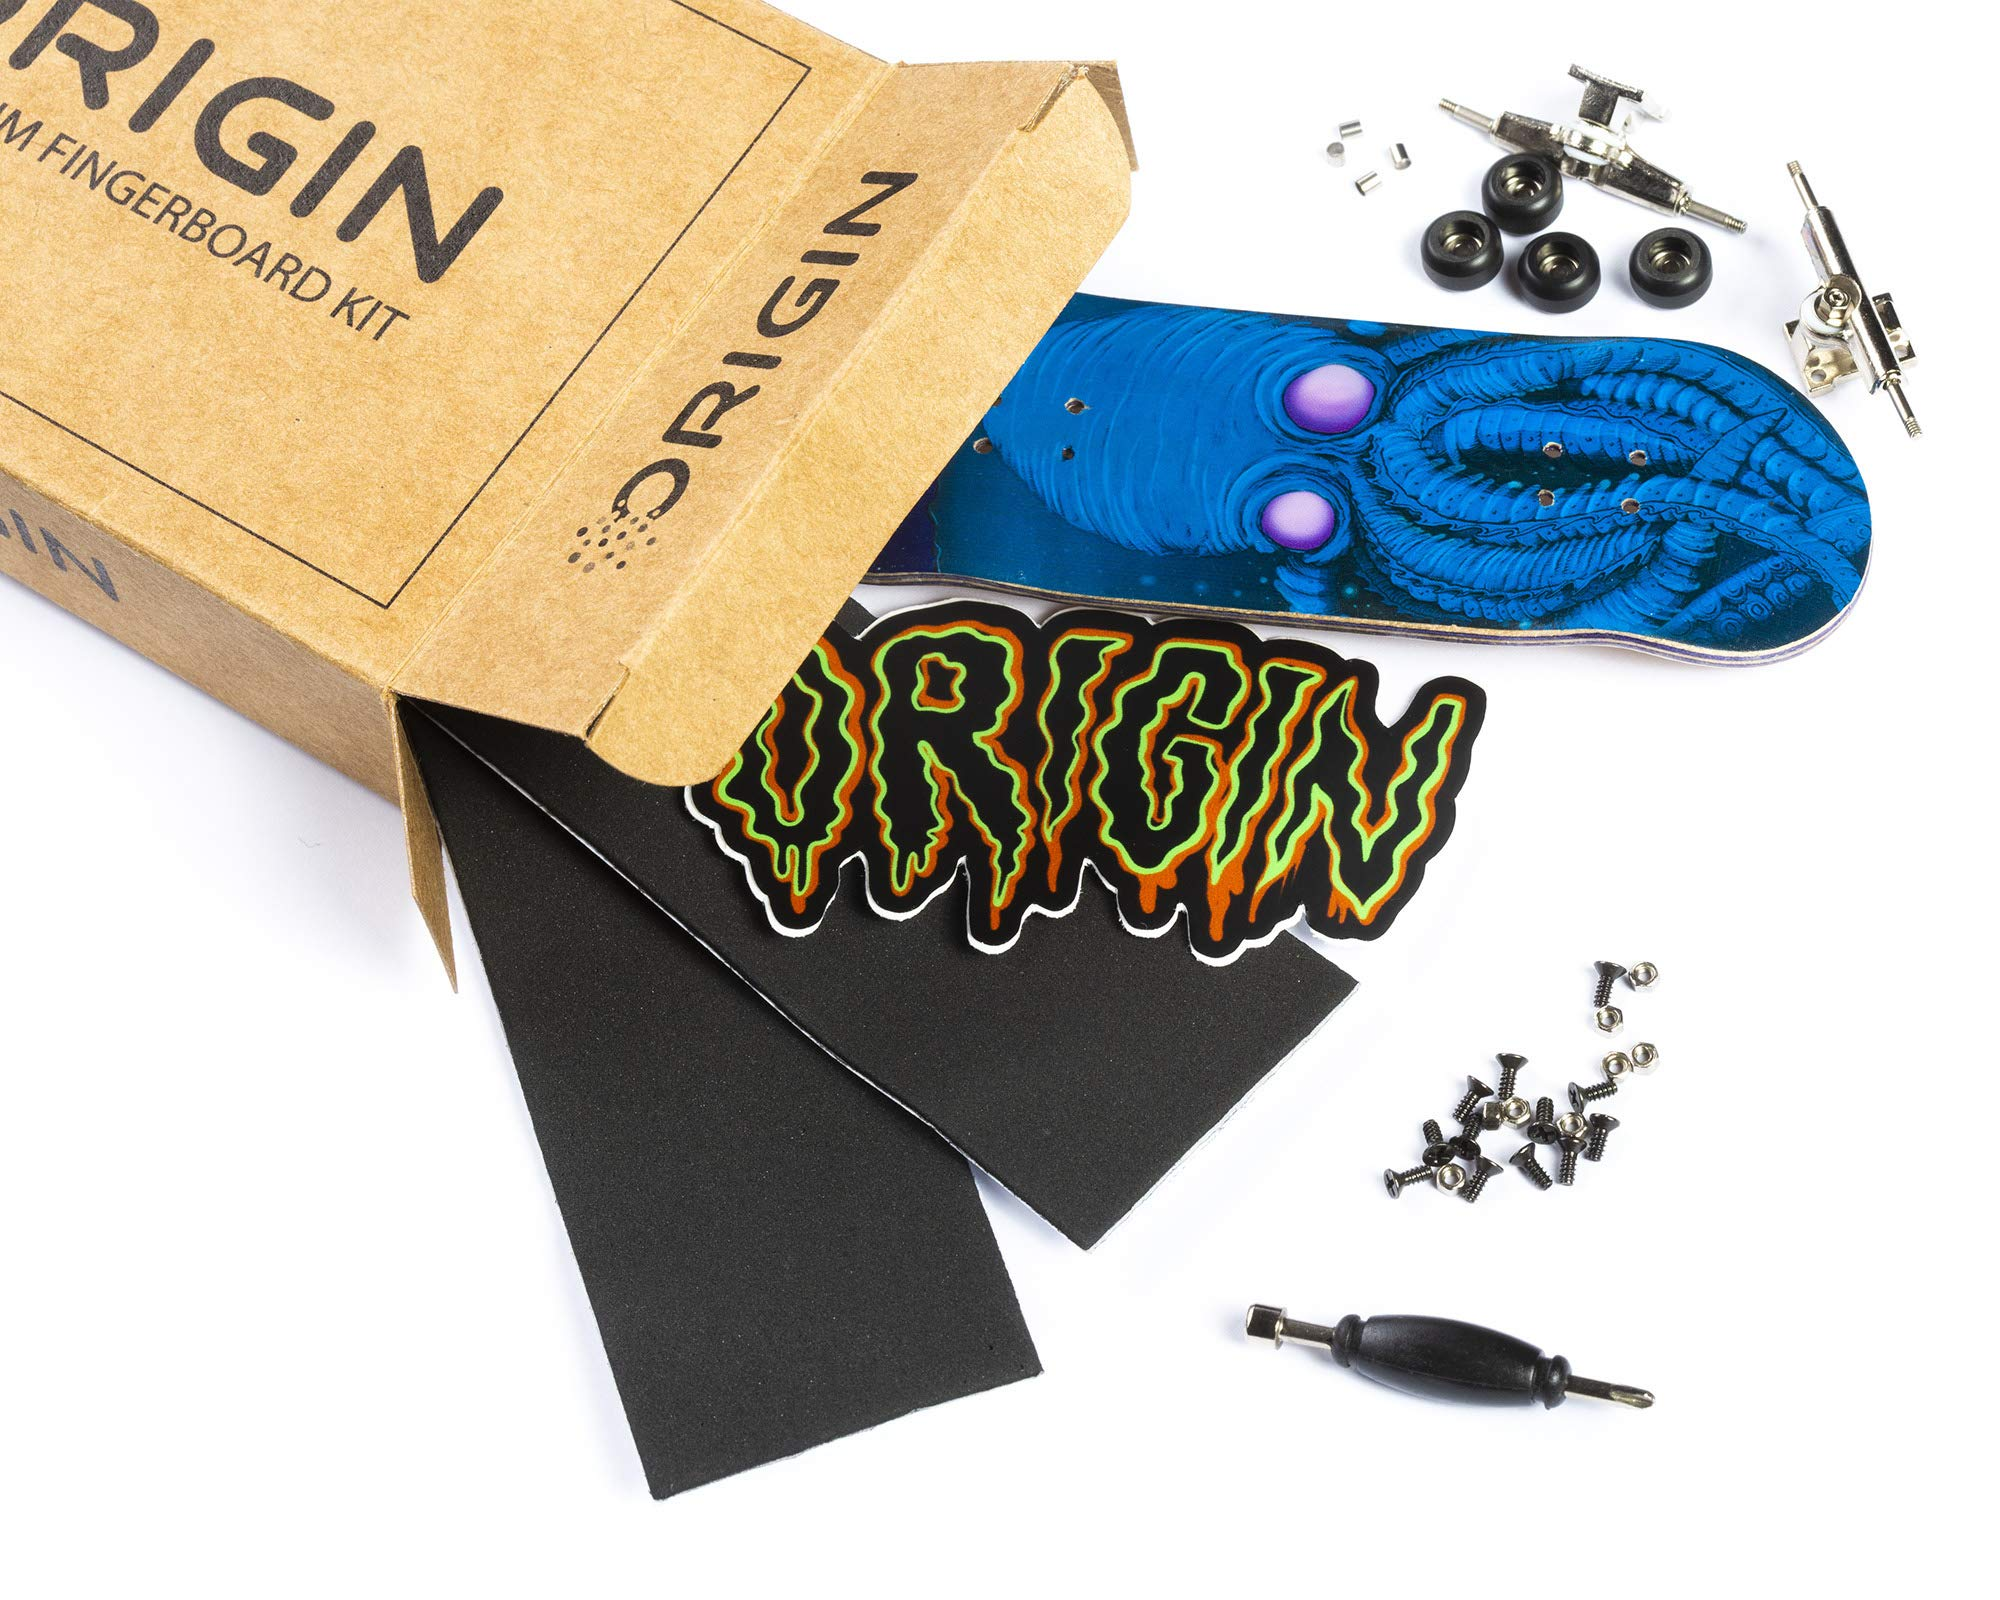 Origin Fingerboards Premium Graphic Fingerboard Kit - 32mm 5-Ply Canadian Maple Skateboard Toy with CNC Bearing Wheels (Kraken)